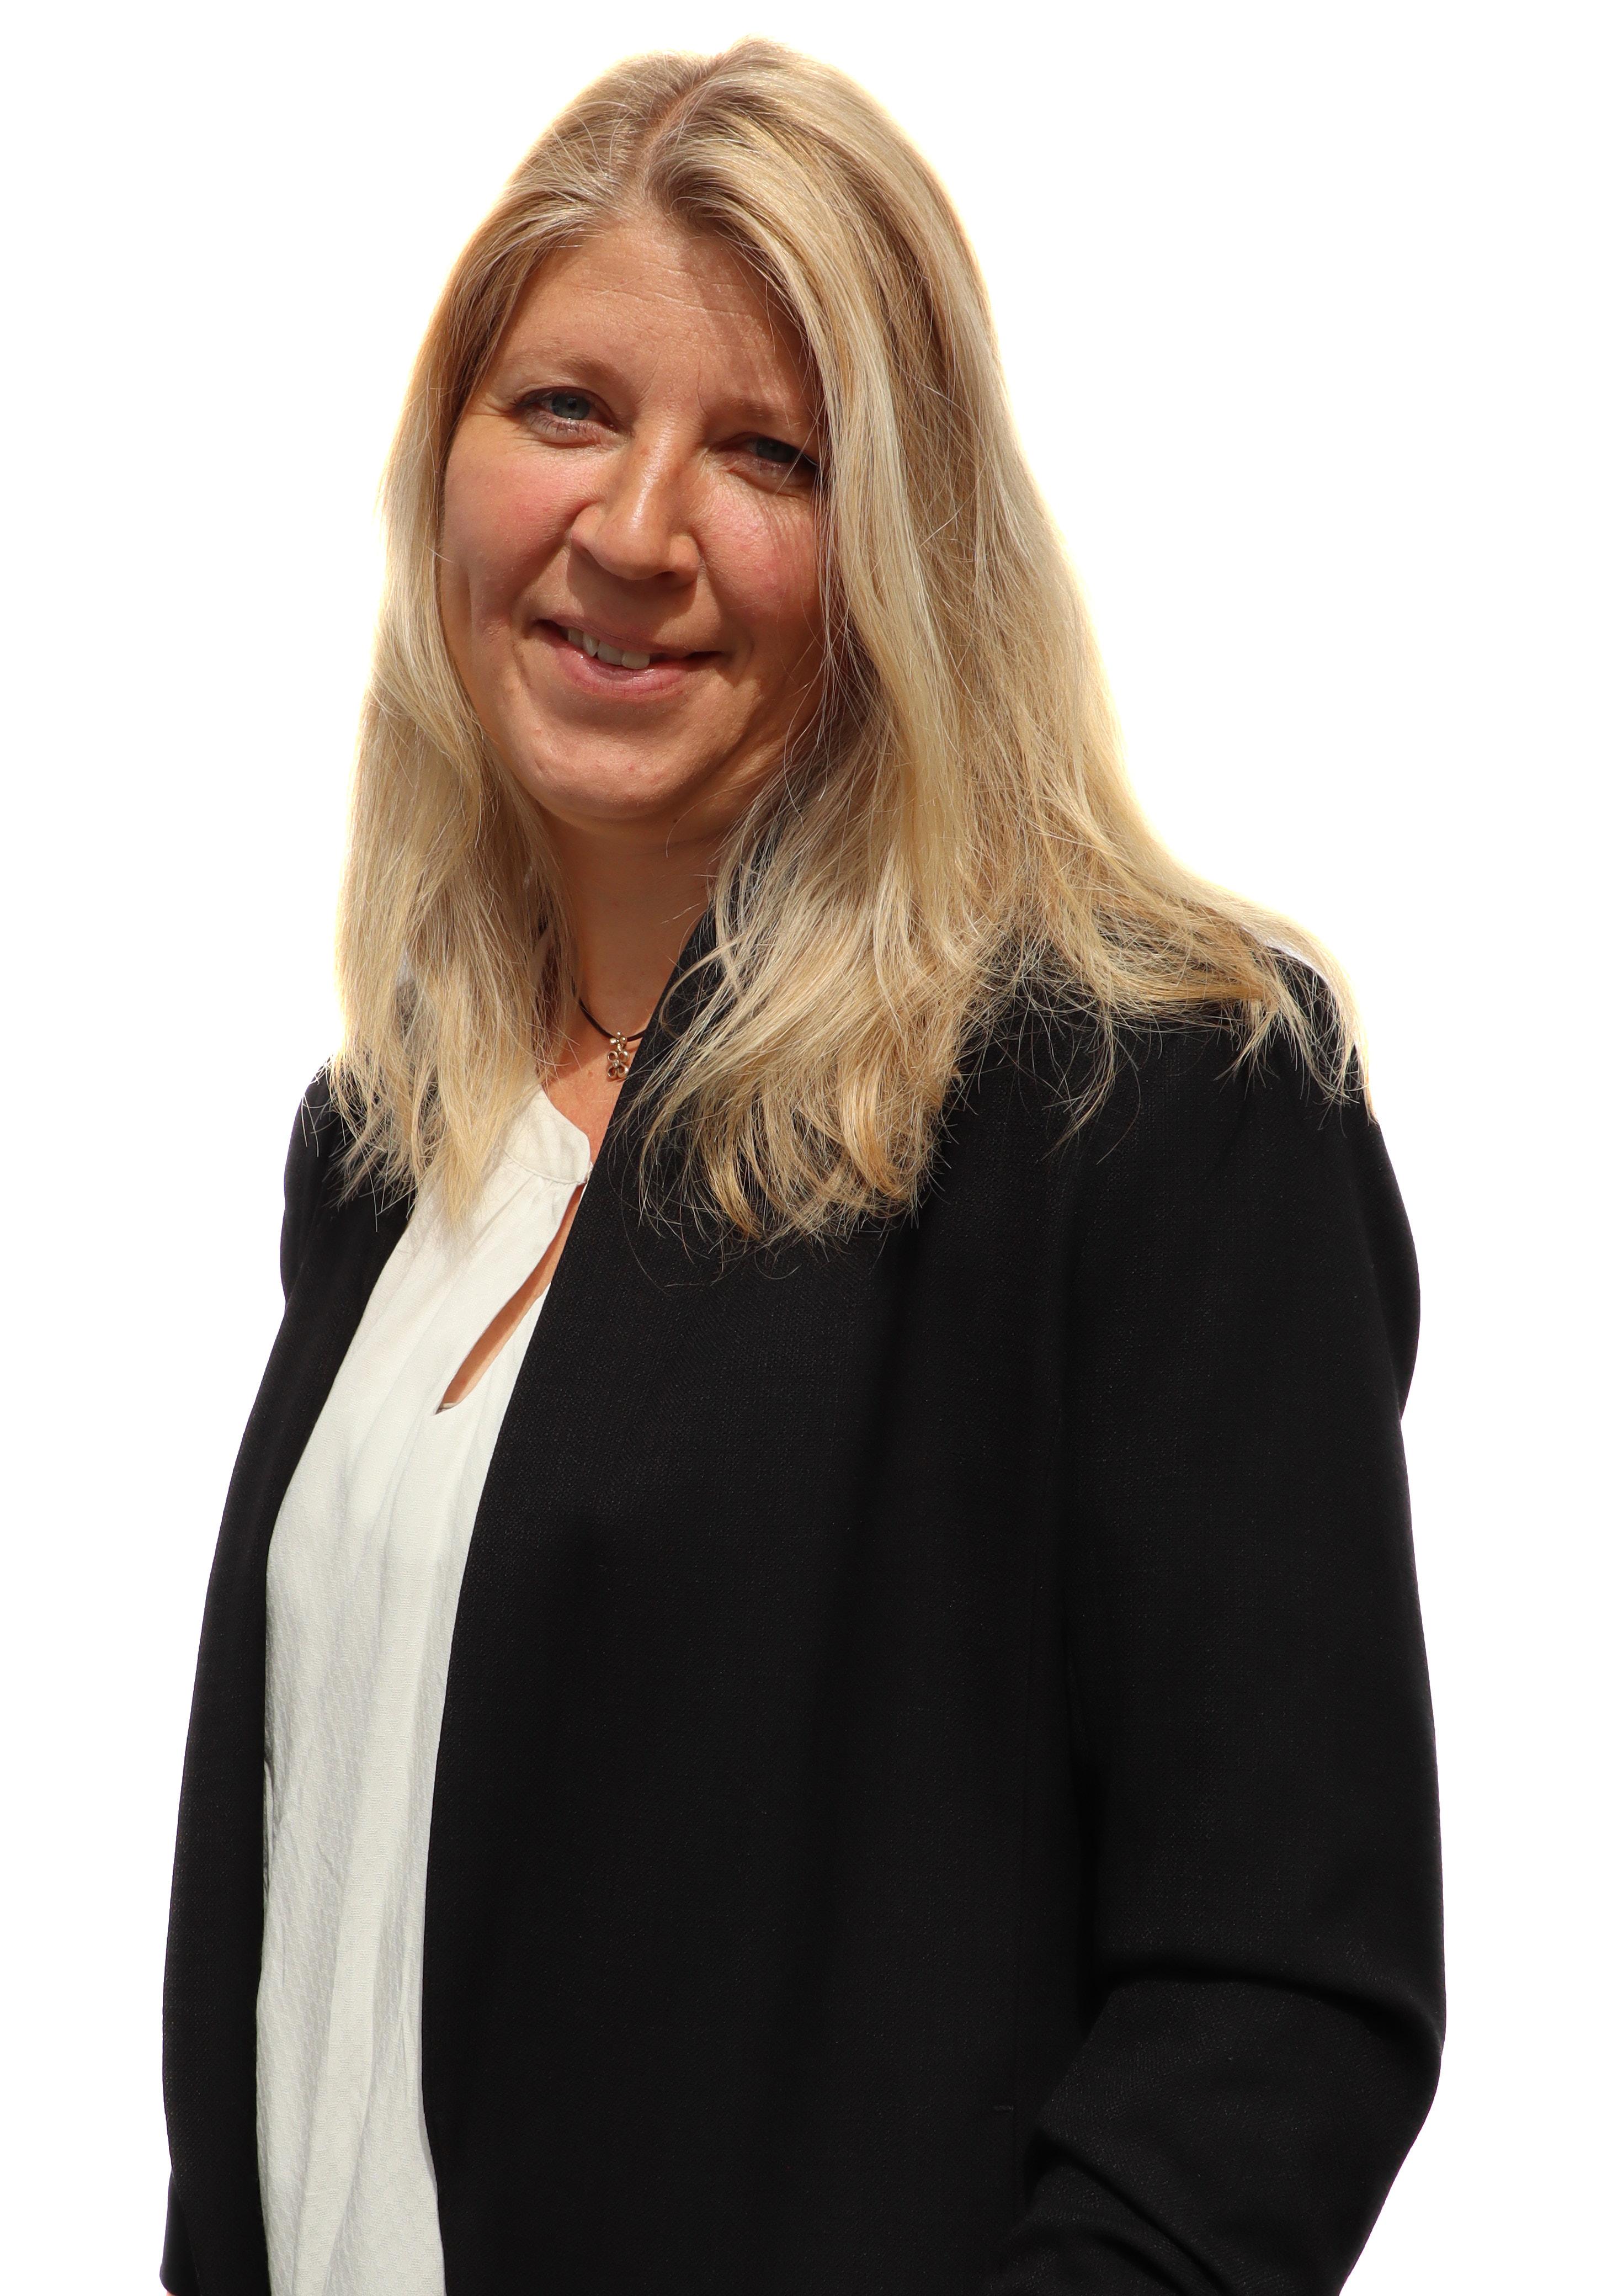 Annette Wass Nielsen